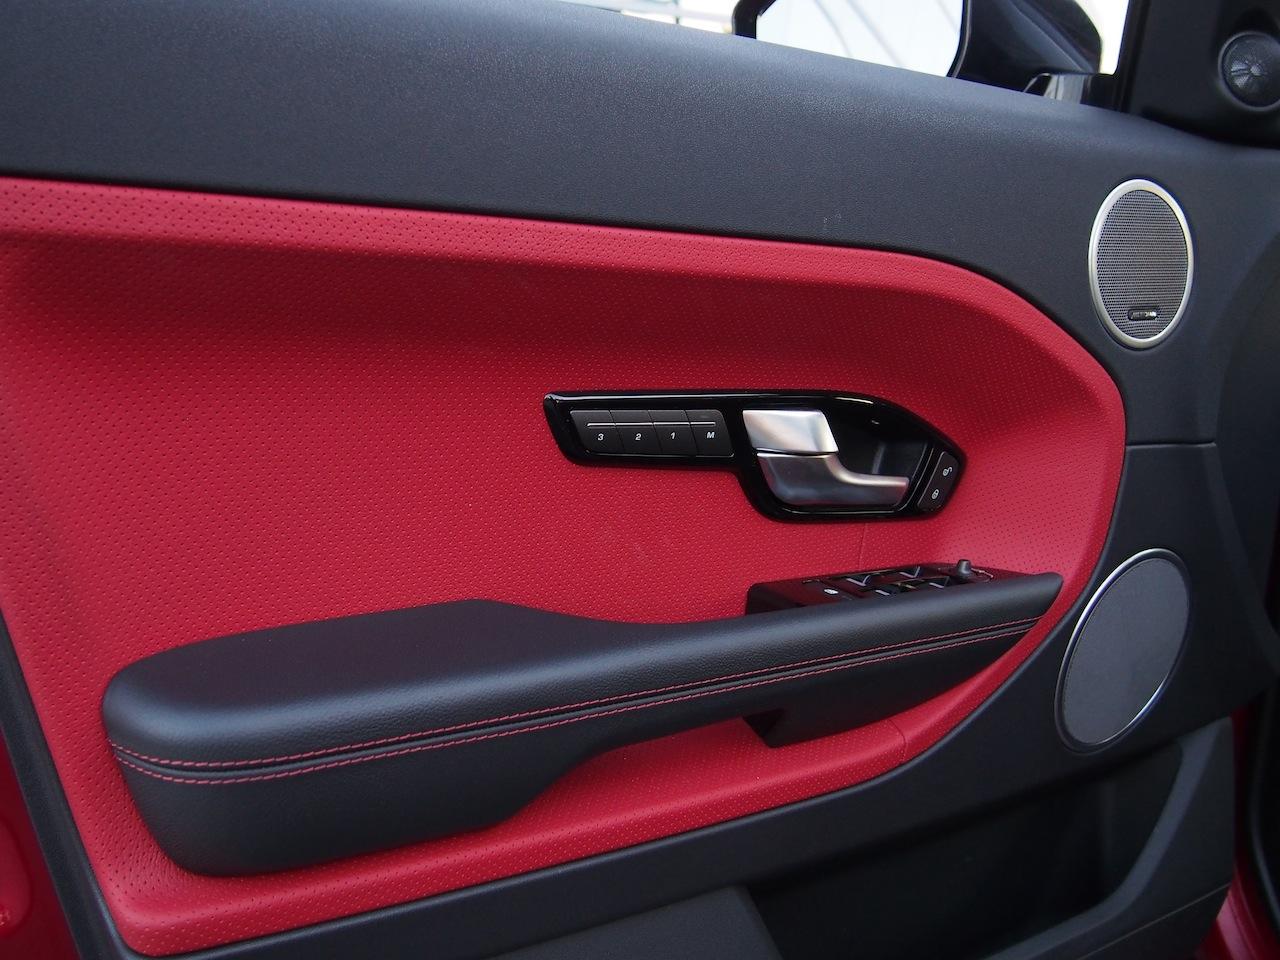 2014 Range Rover Evoque 5 Door Review Cars Photos Test